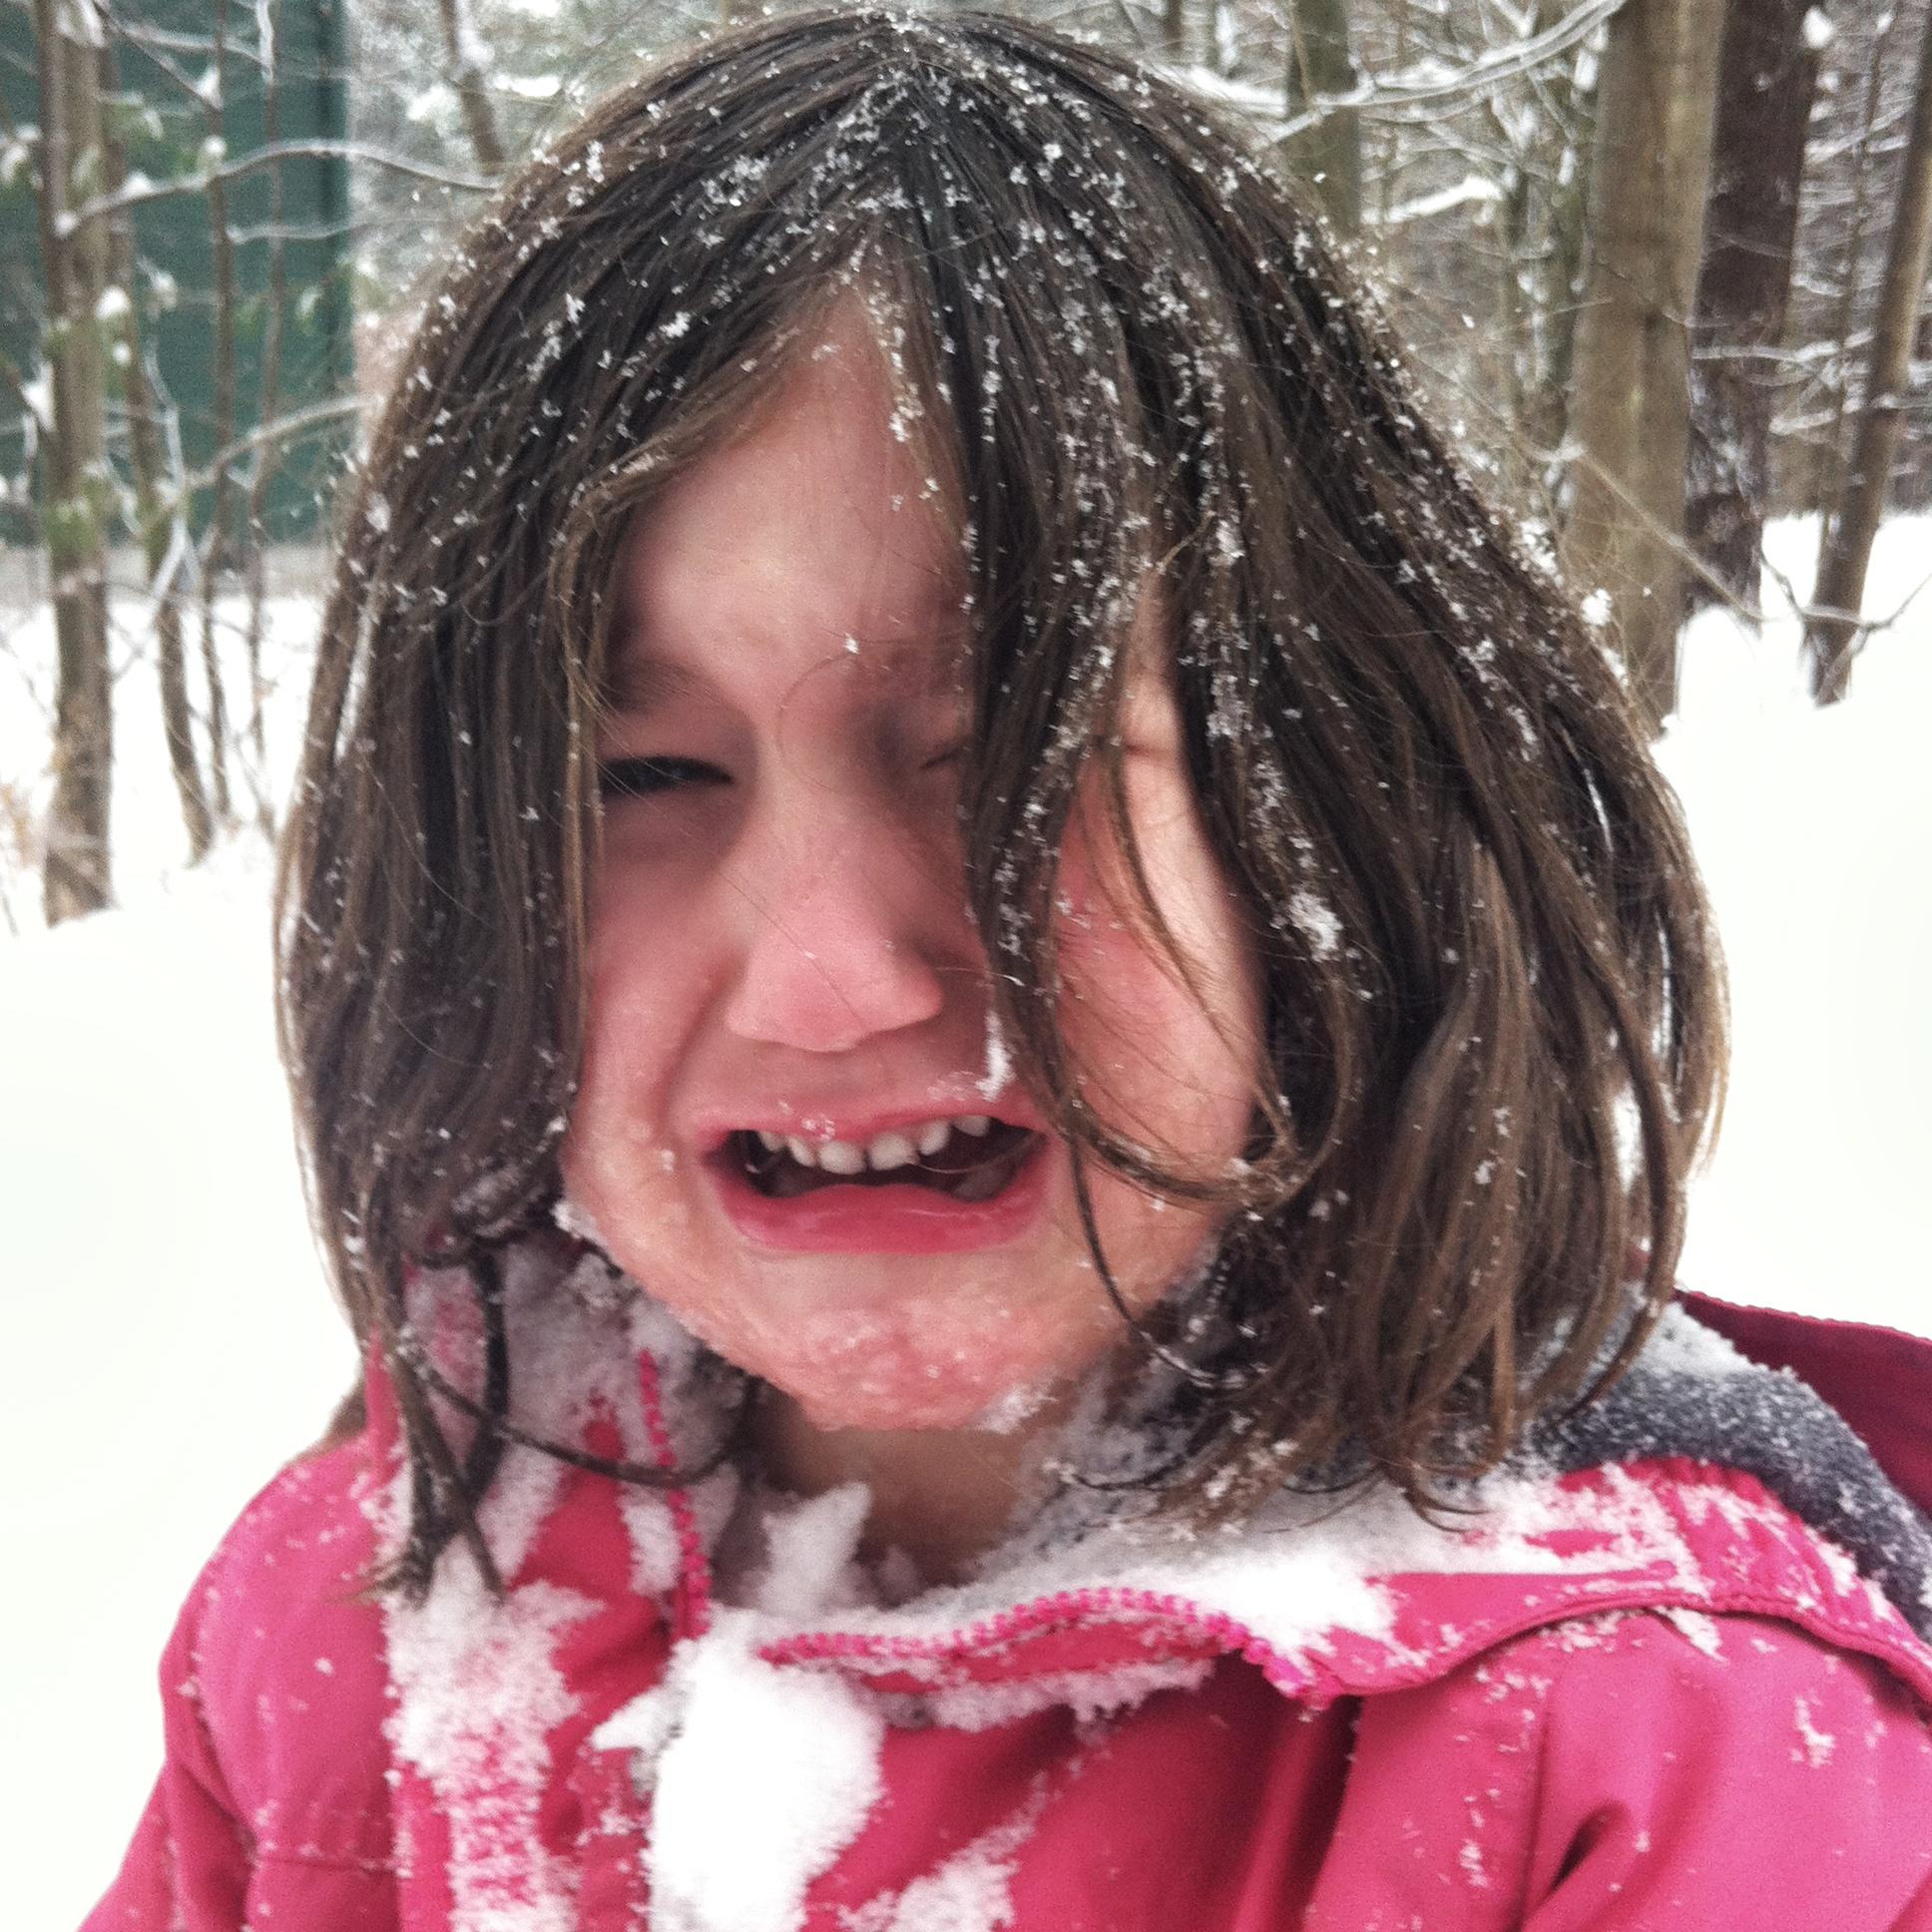 SnowyFace